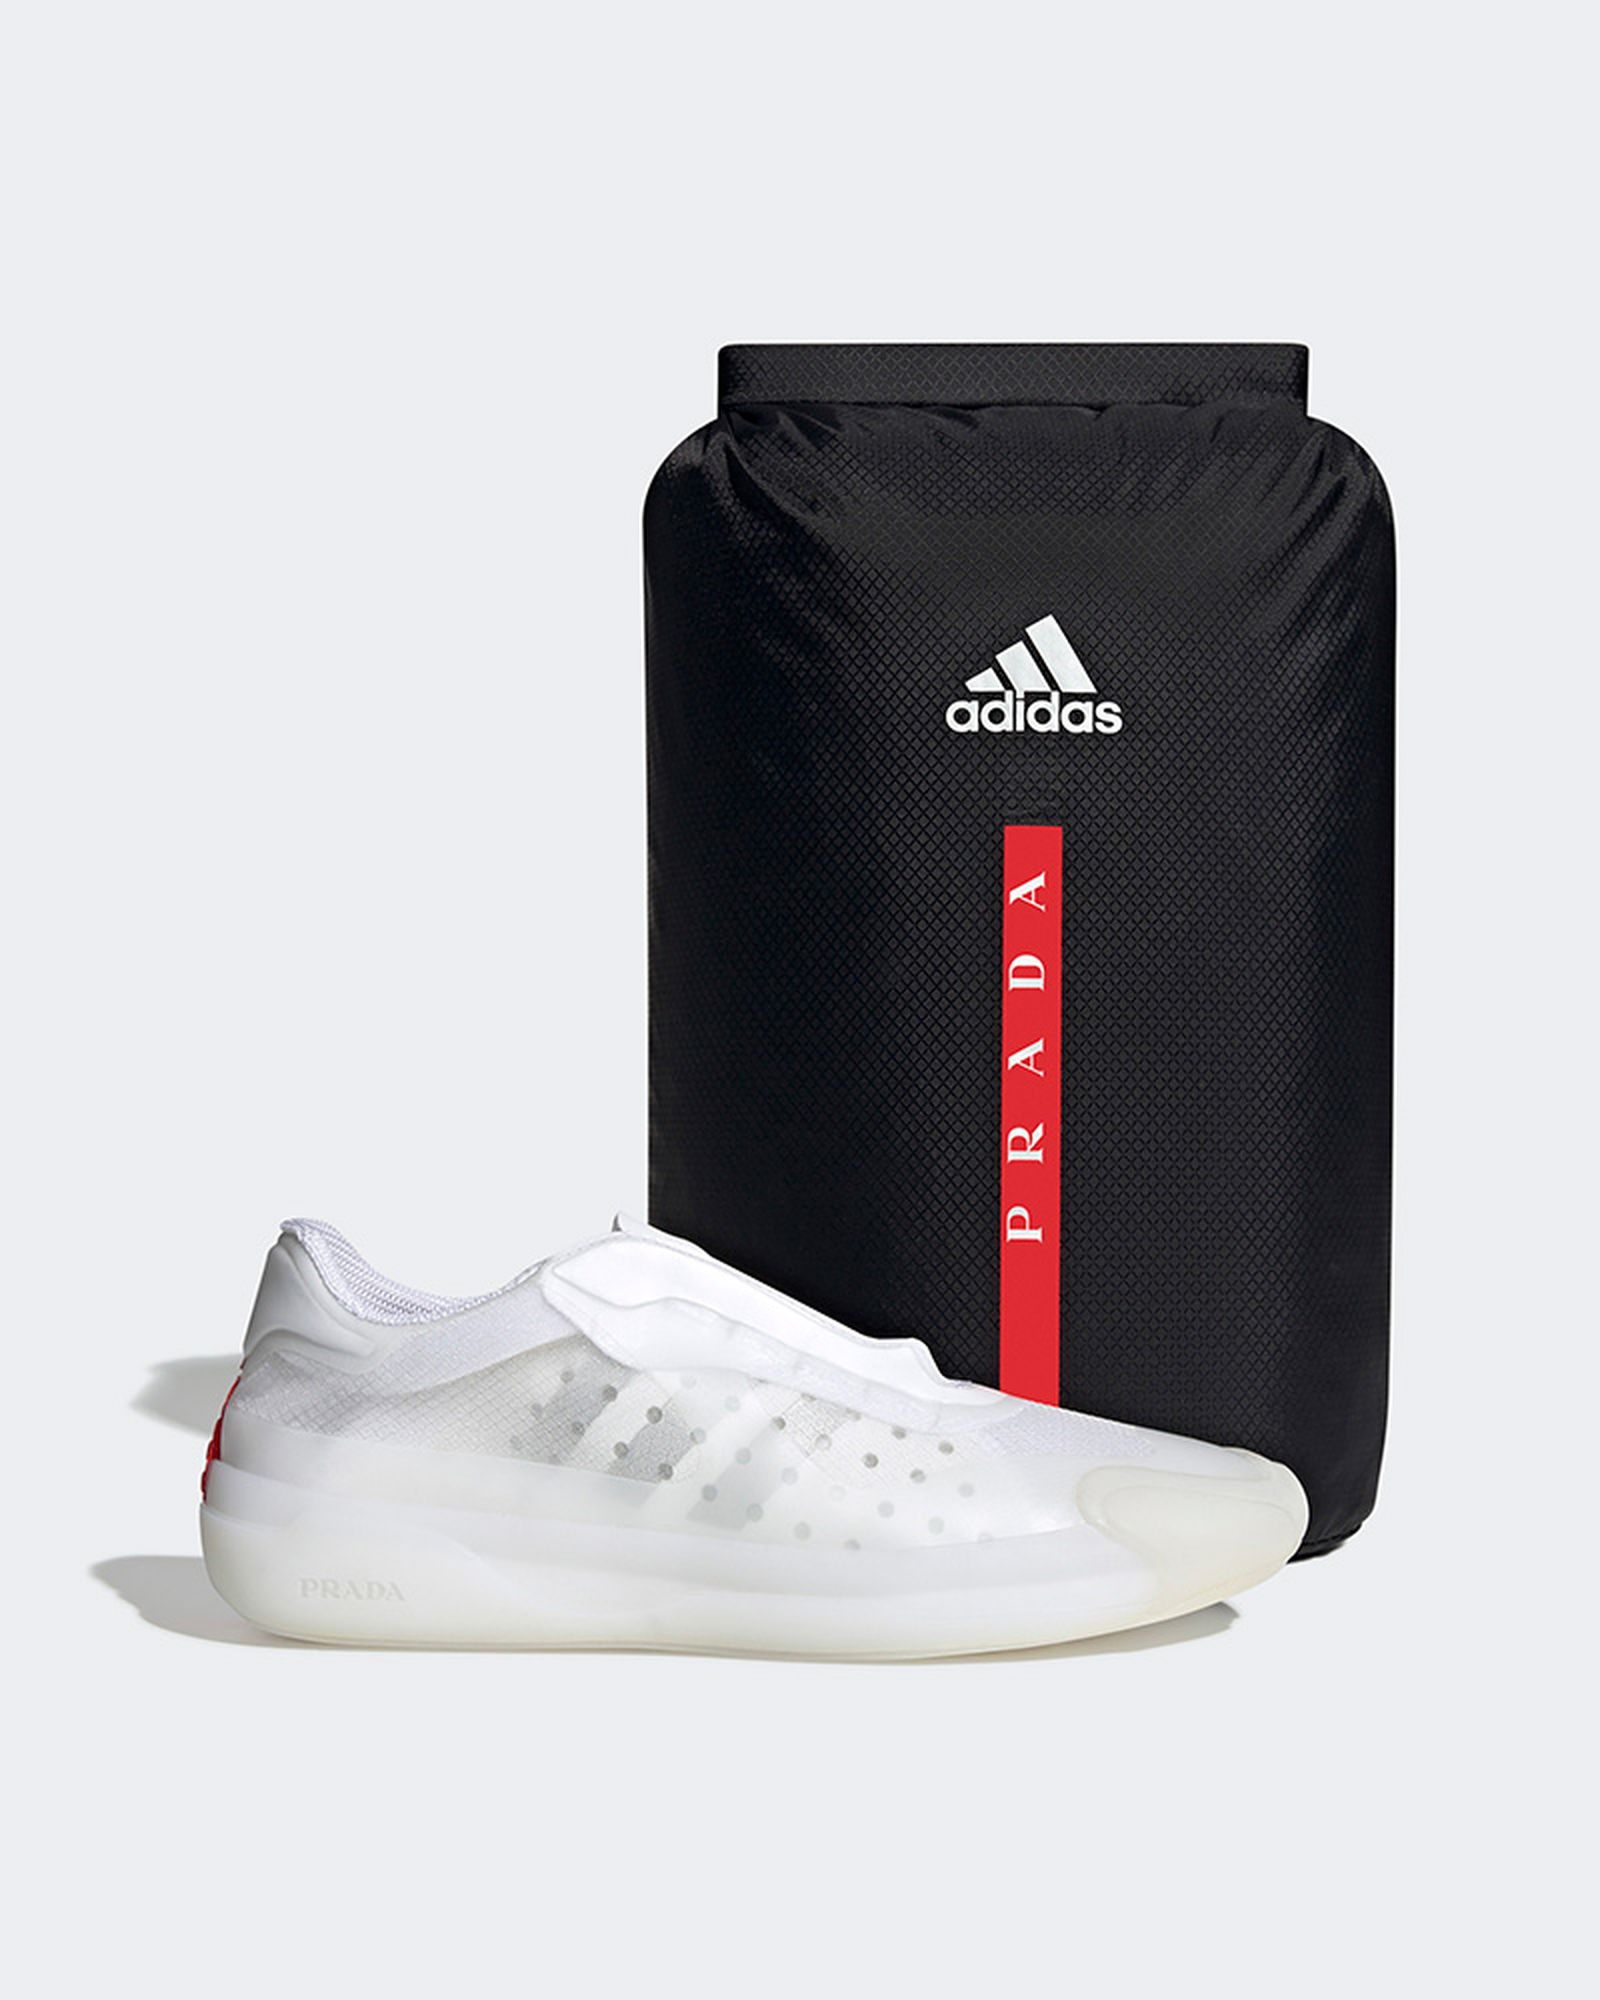 prada-adidas-ap-luna-rossa-21-release-date-price-02